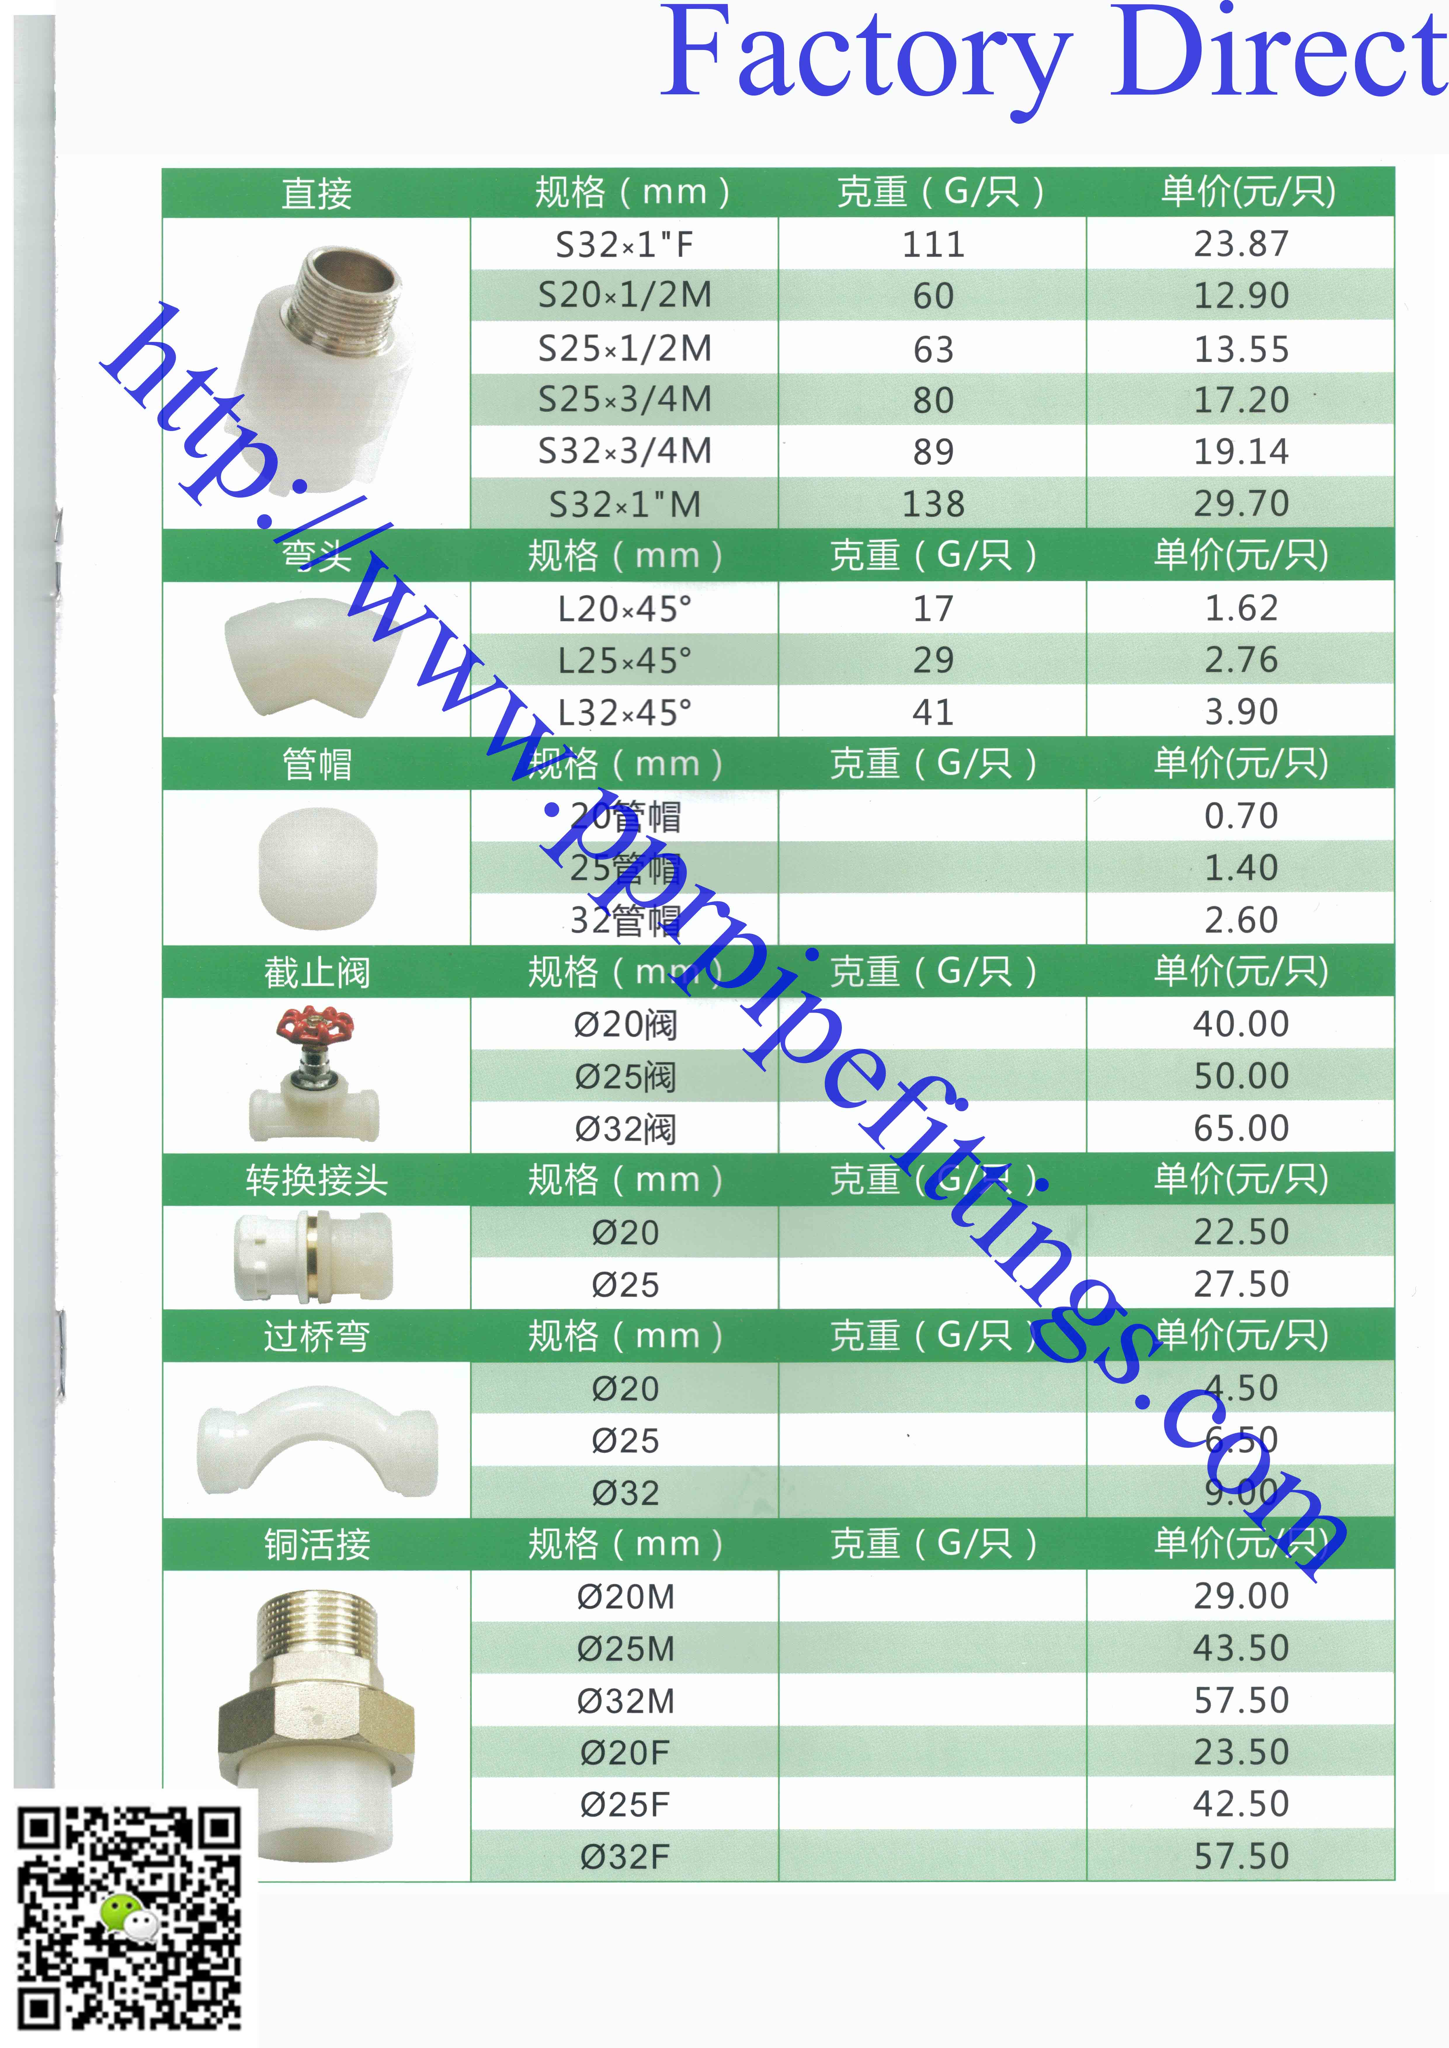 PERT PIPE FITTINGS for underfloor heating system